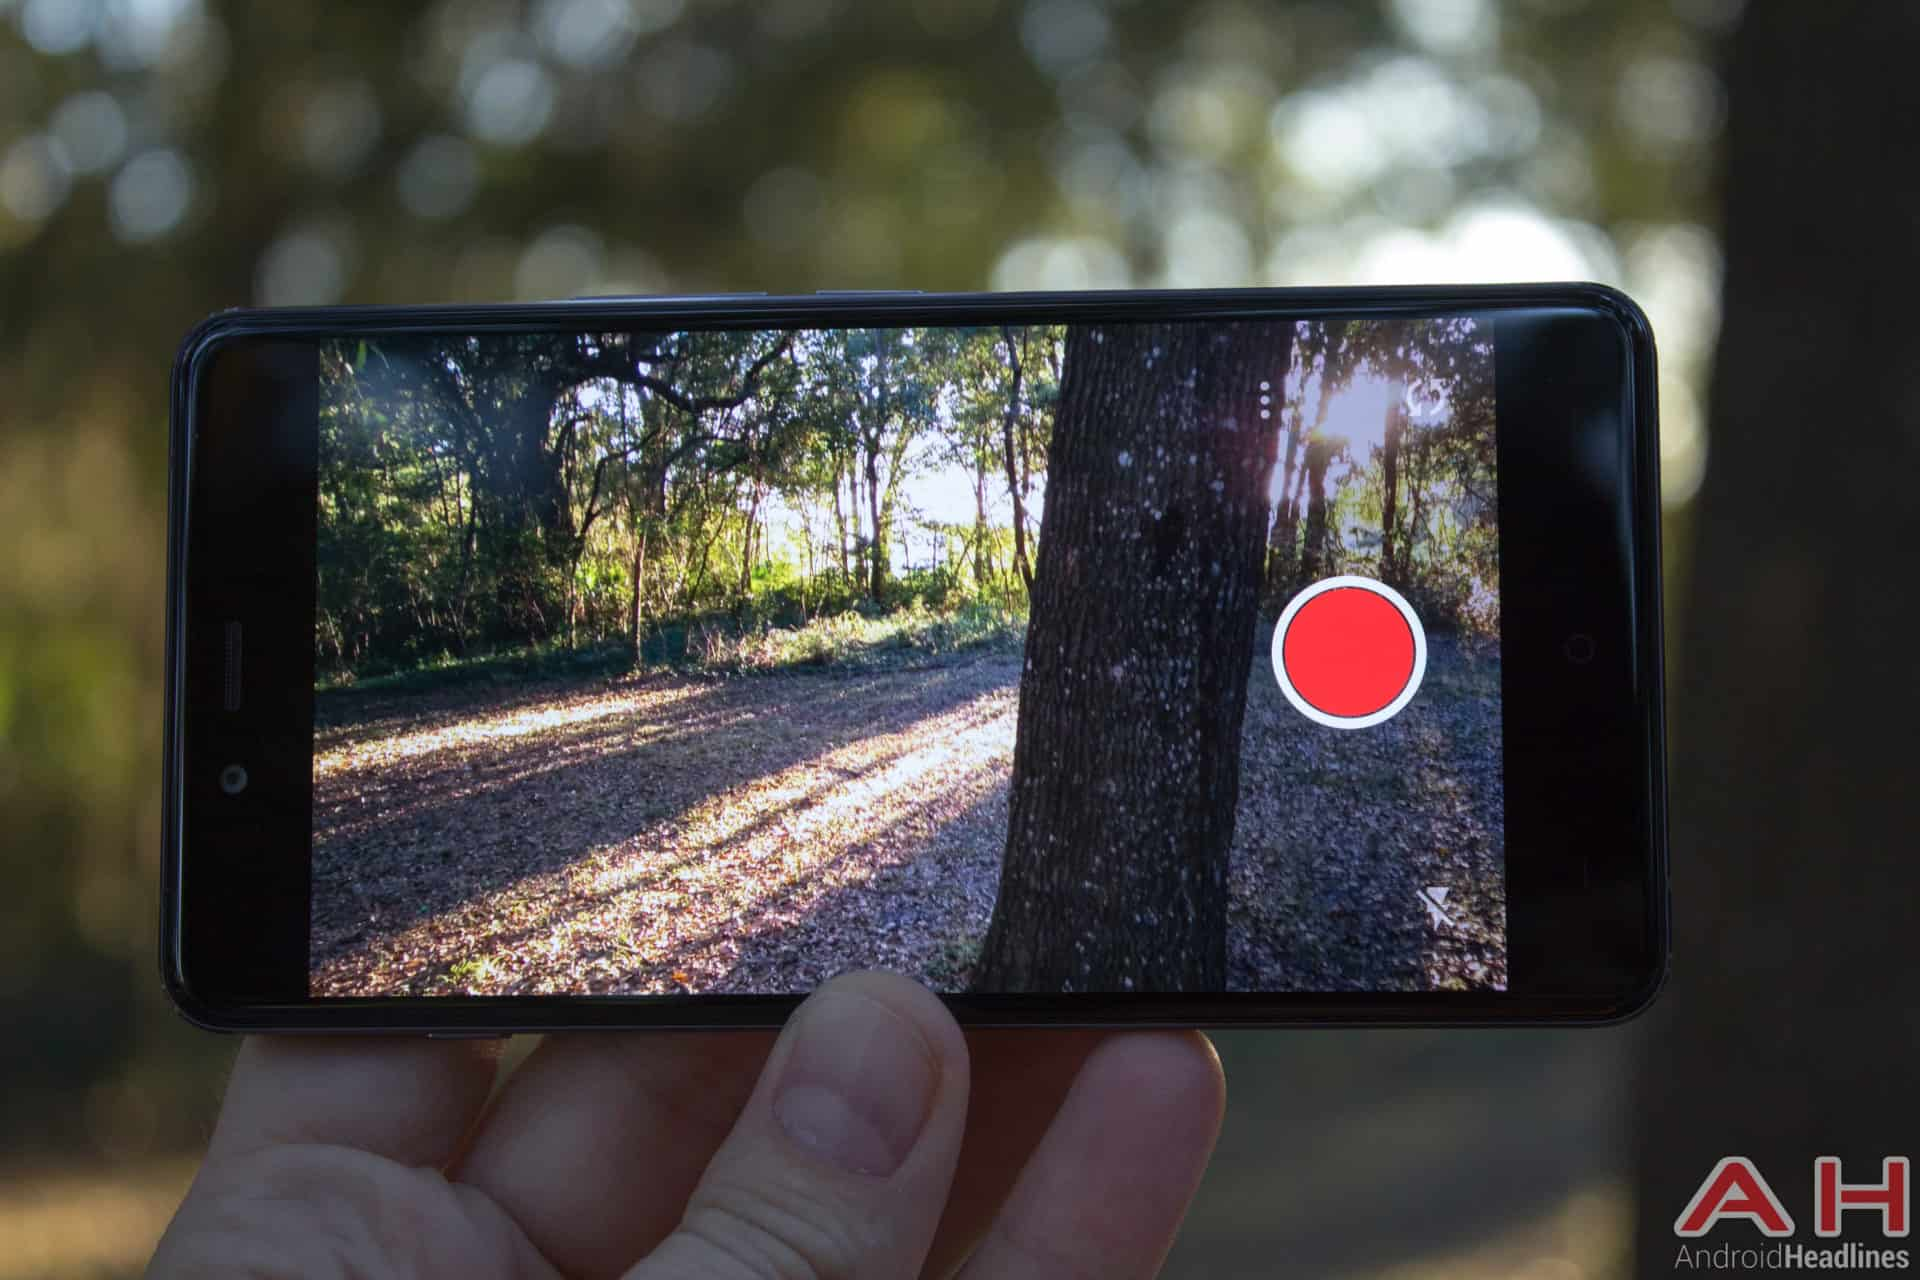 OnePlus-X-AH-camera